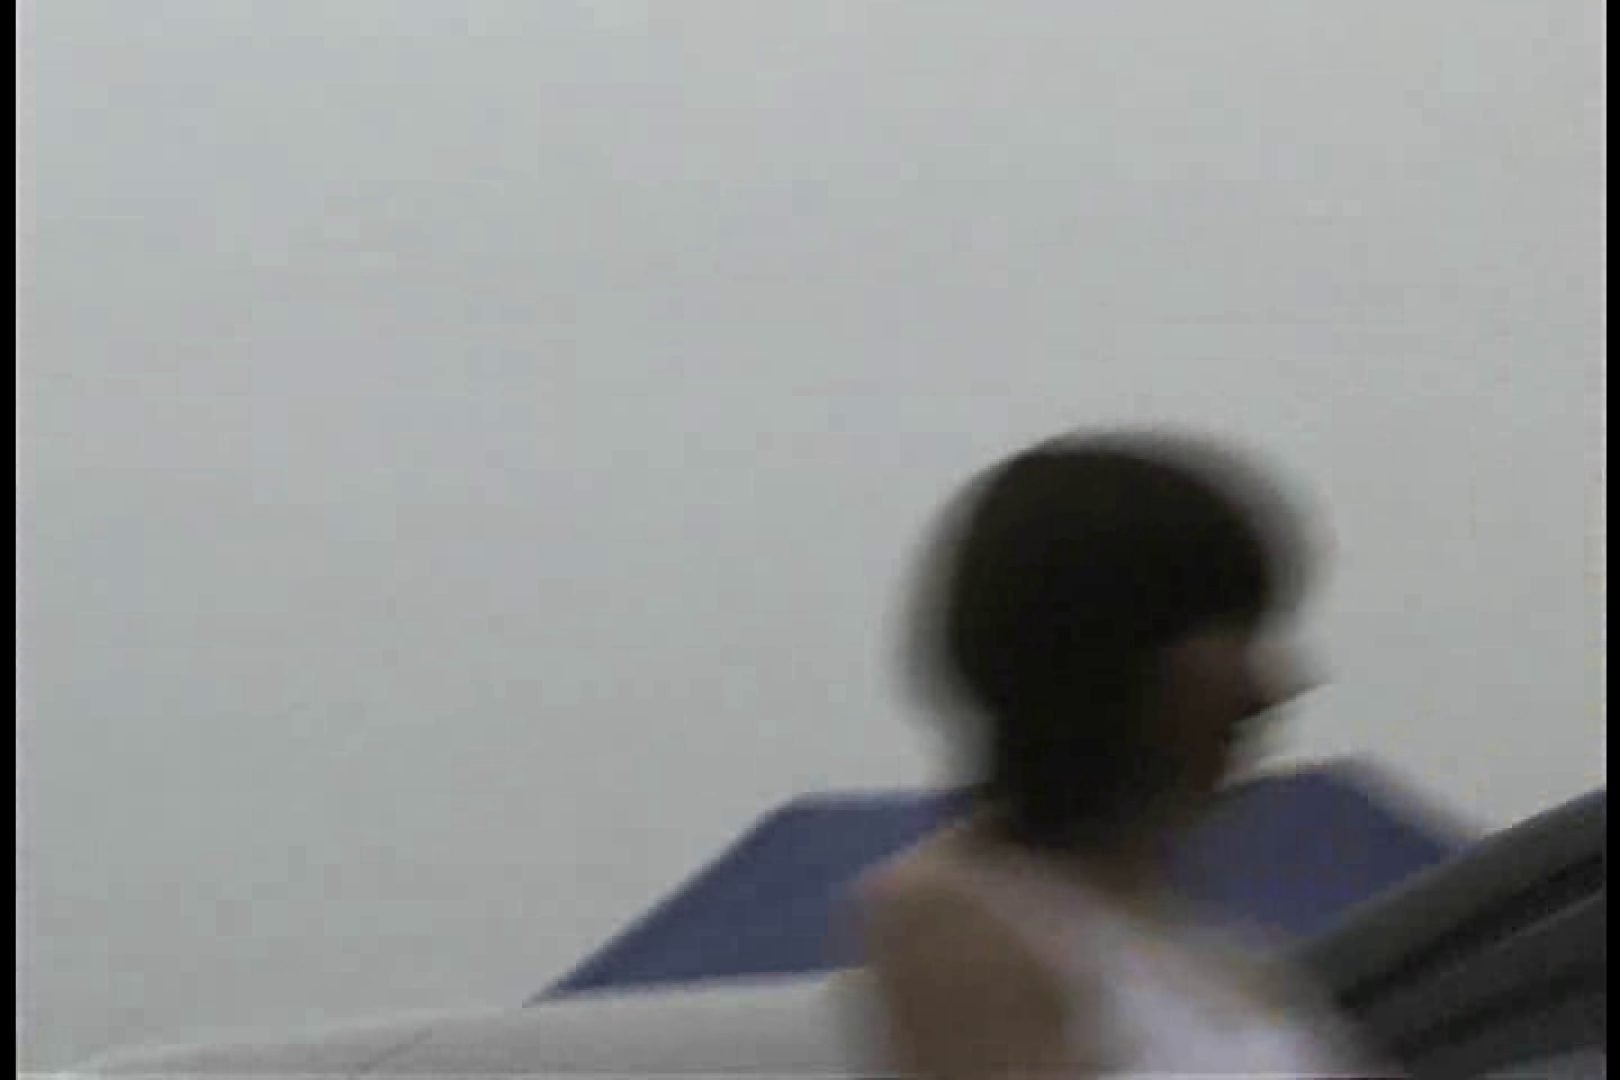 RQカメラ地獄Vol.3 レースクイーン編 ワレメ動画紹介 79画像 56